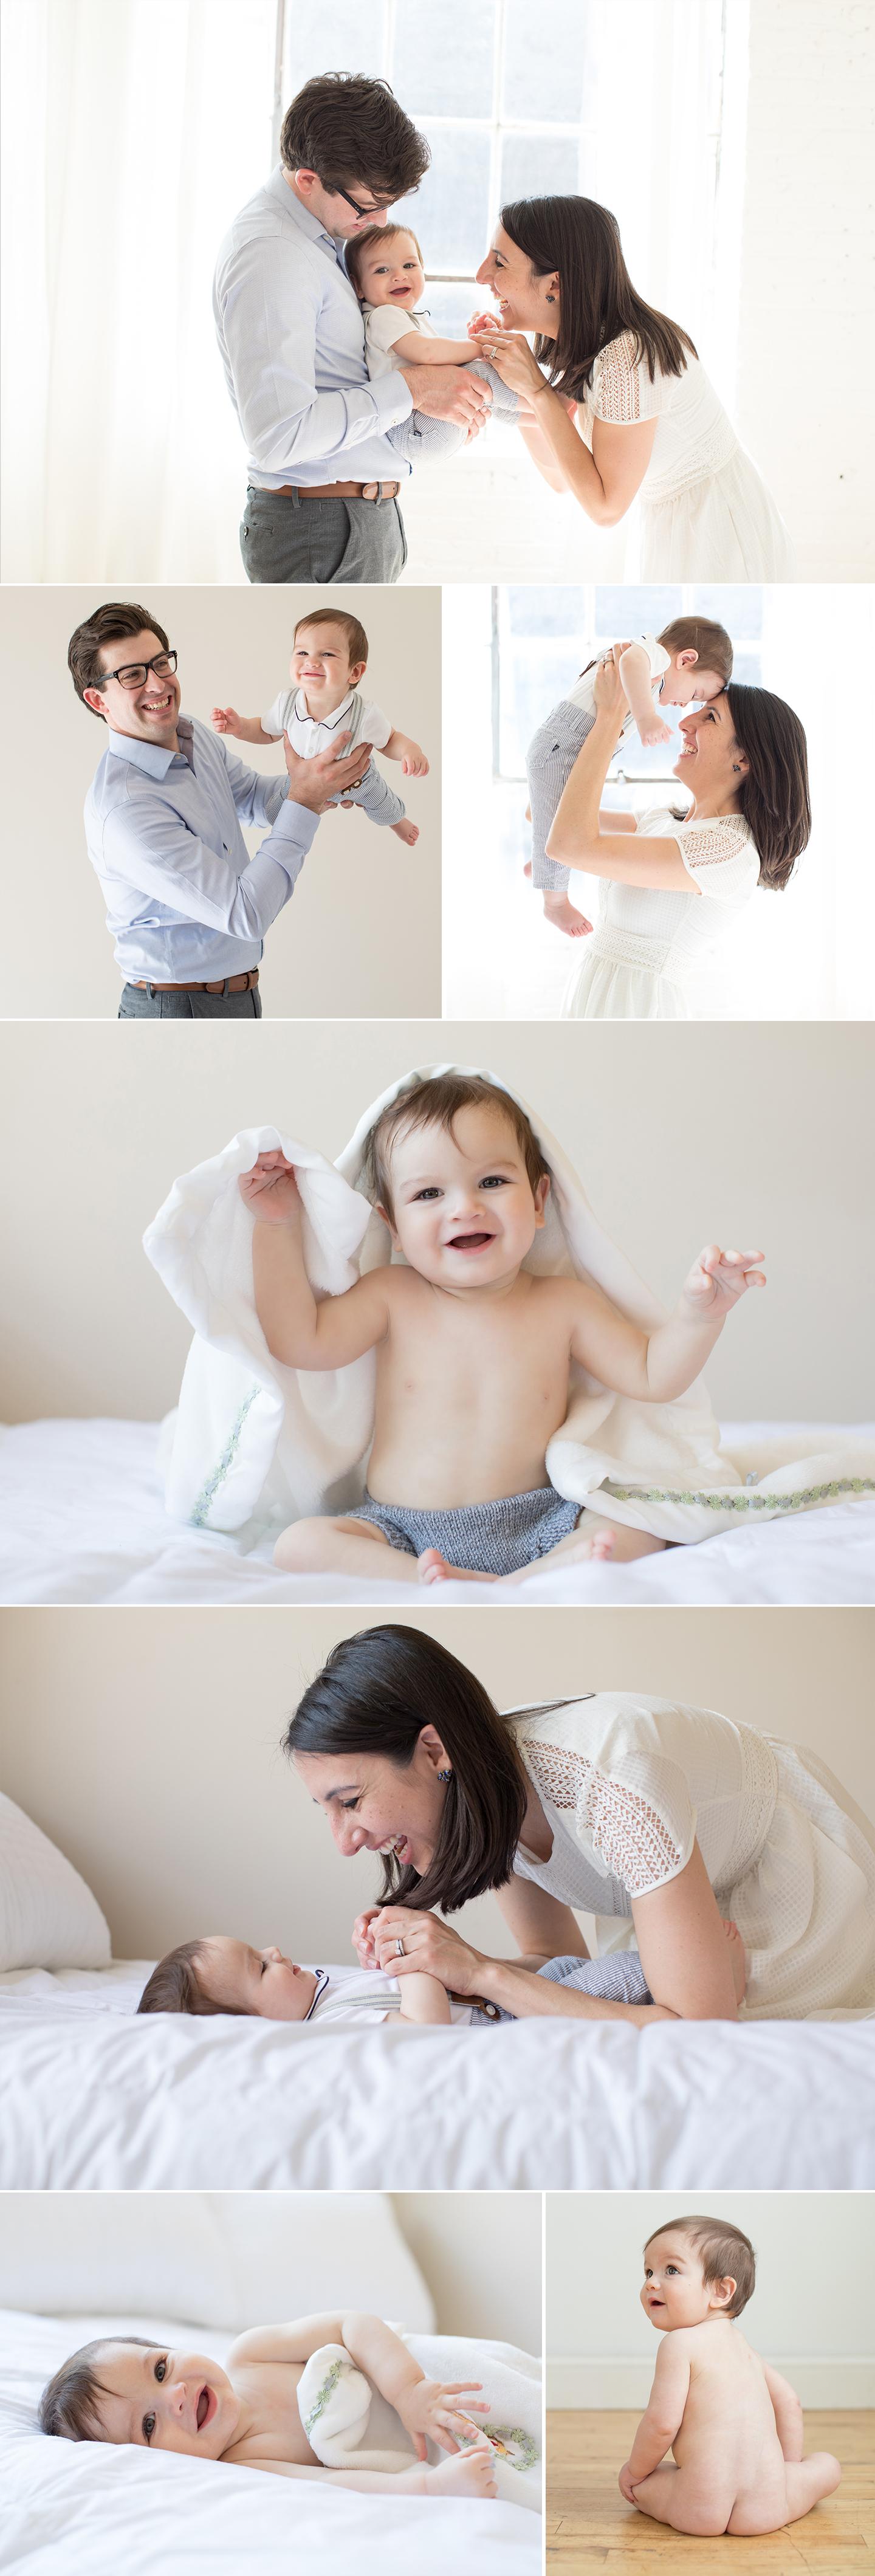 cute_little_family.jpg